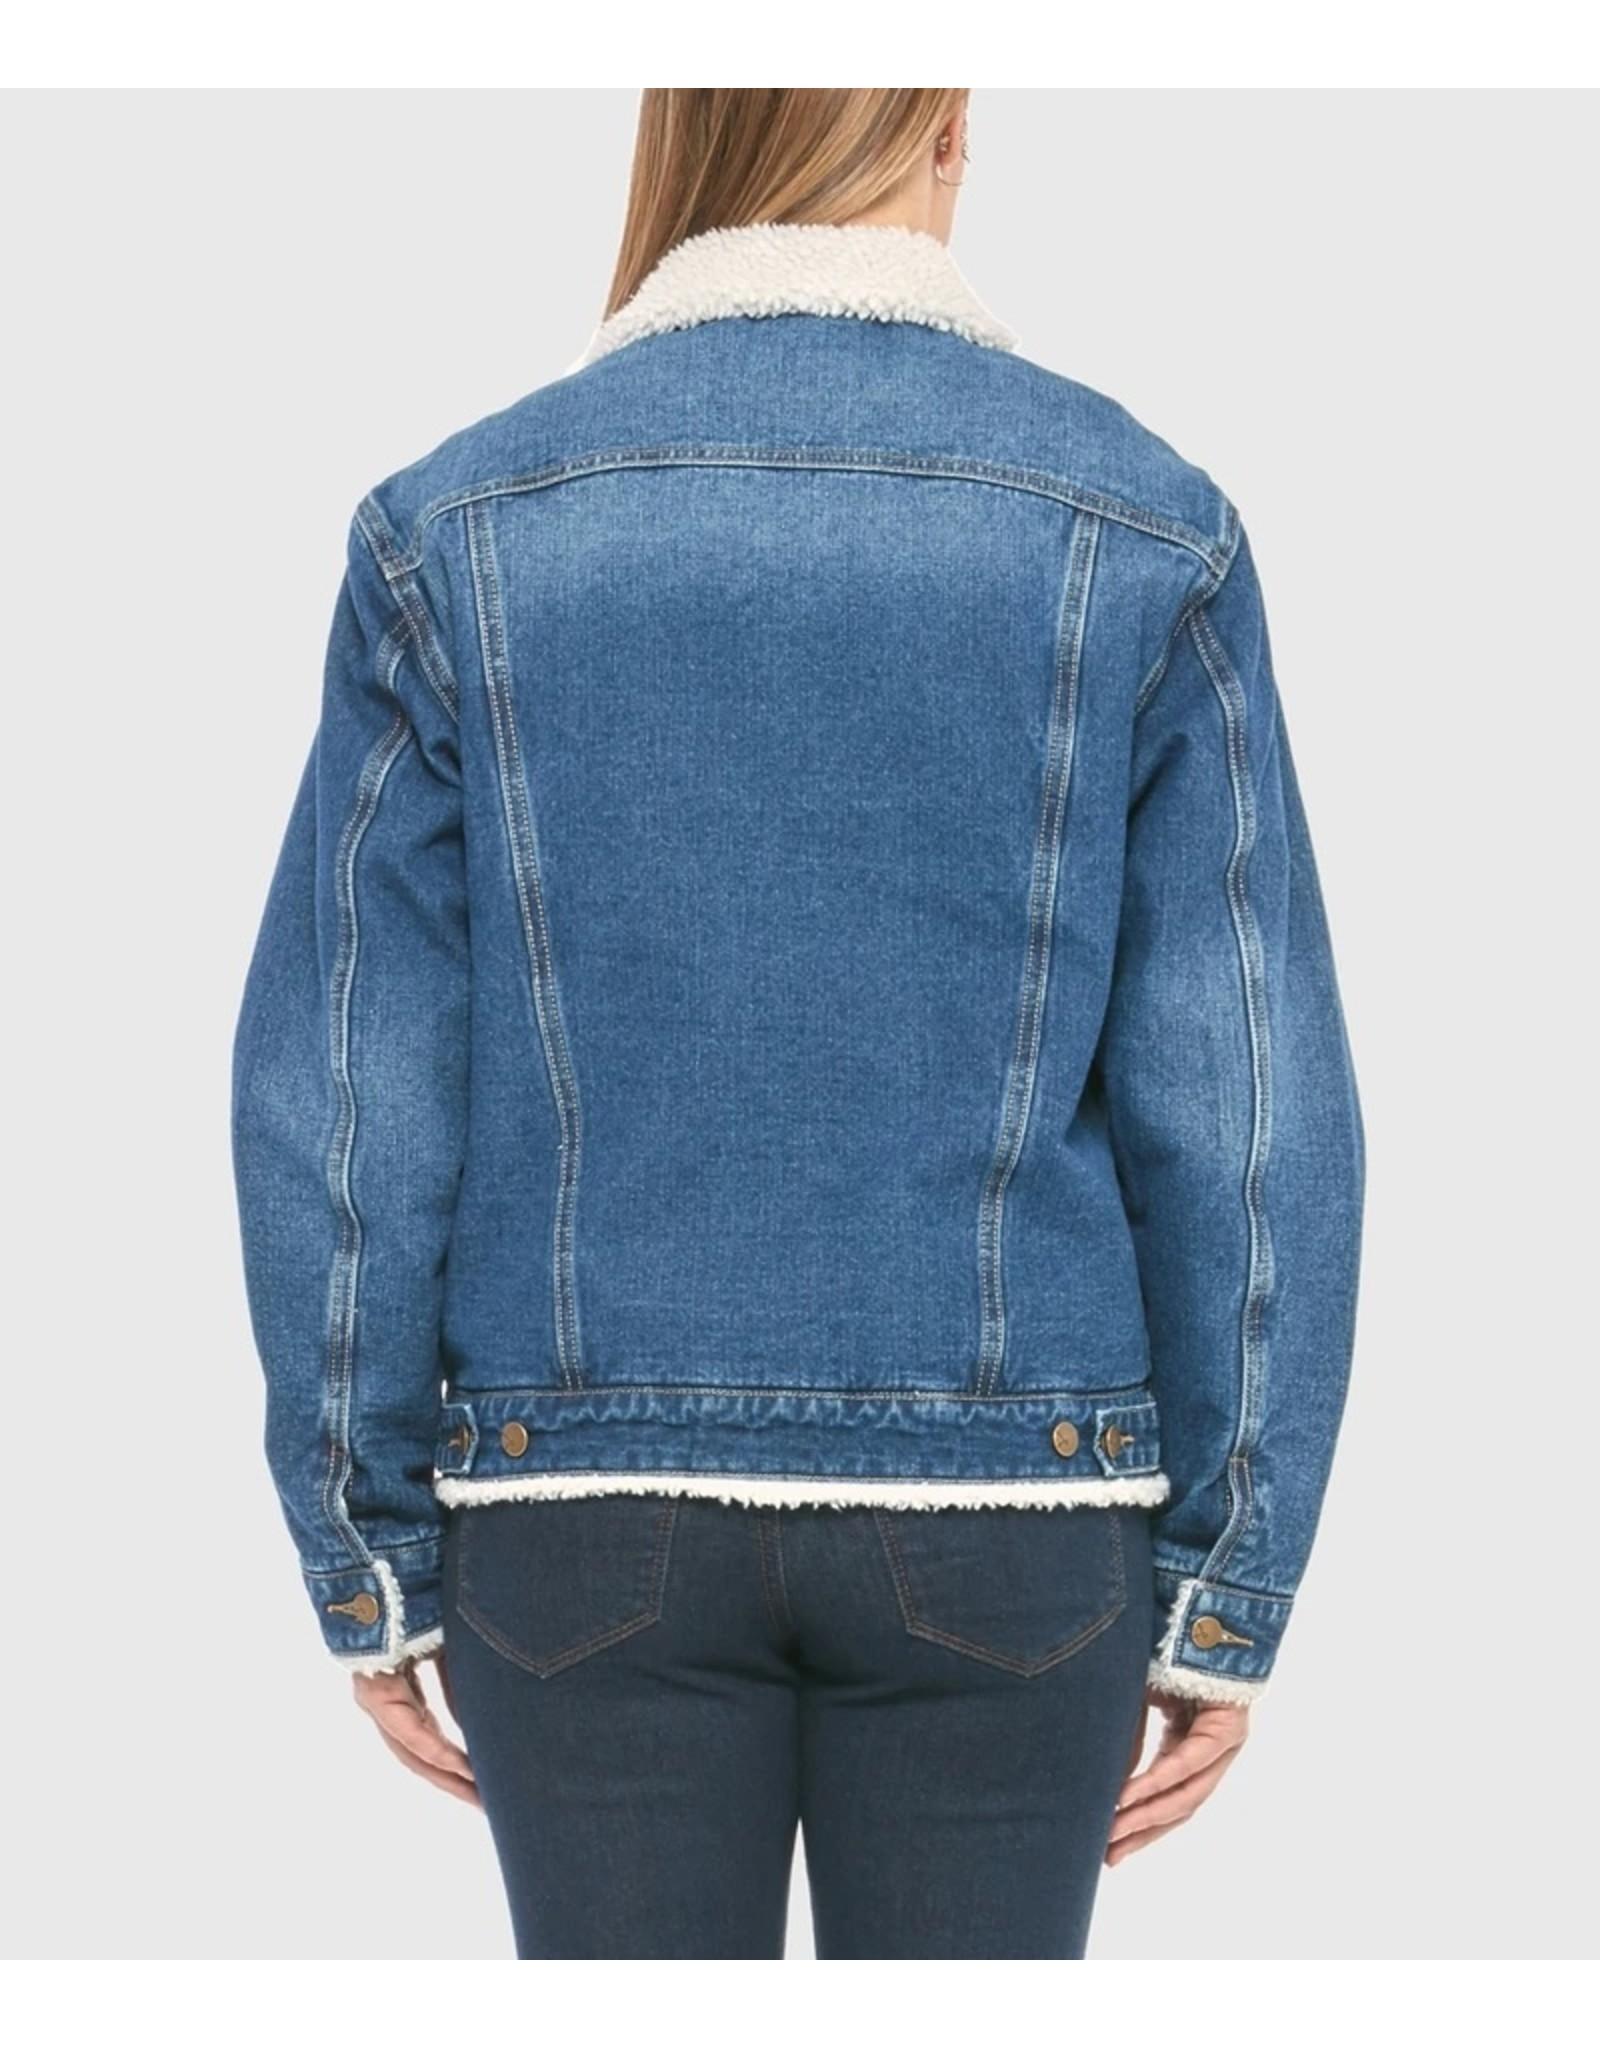 Lola Jeans Ex Boyfriend Jacket